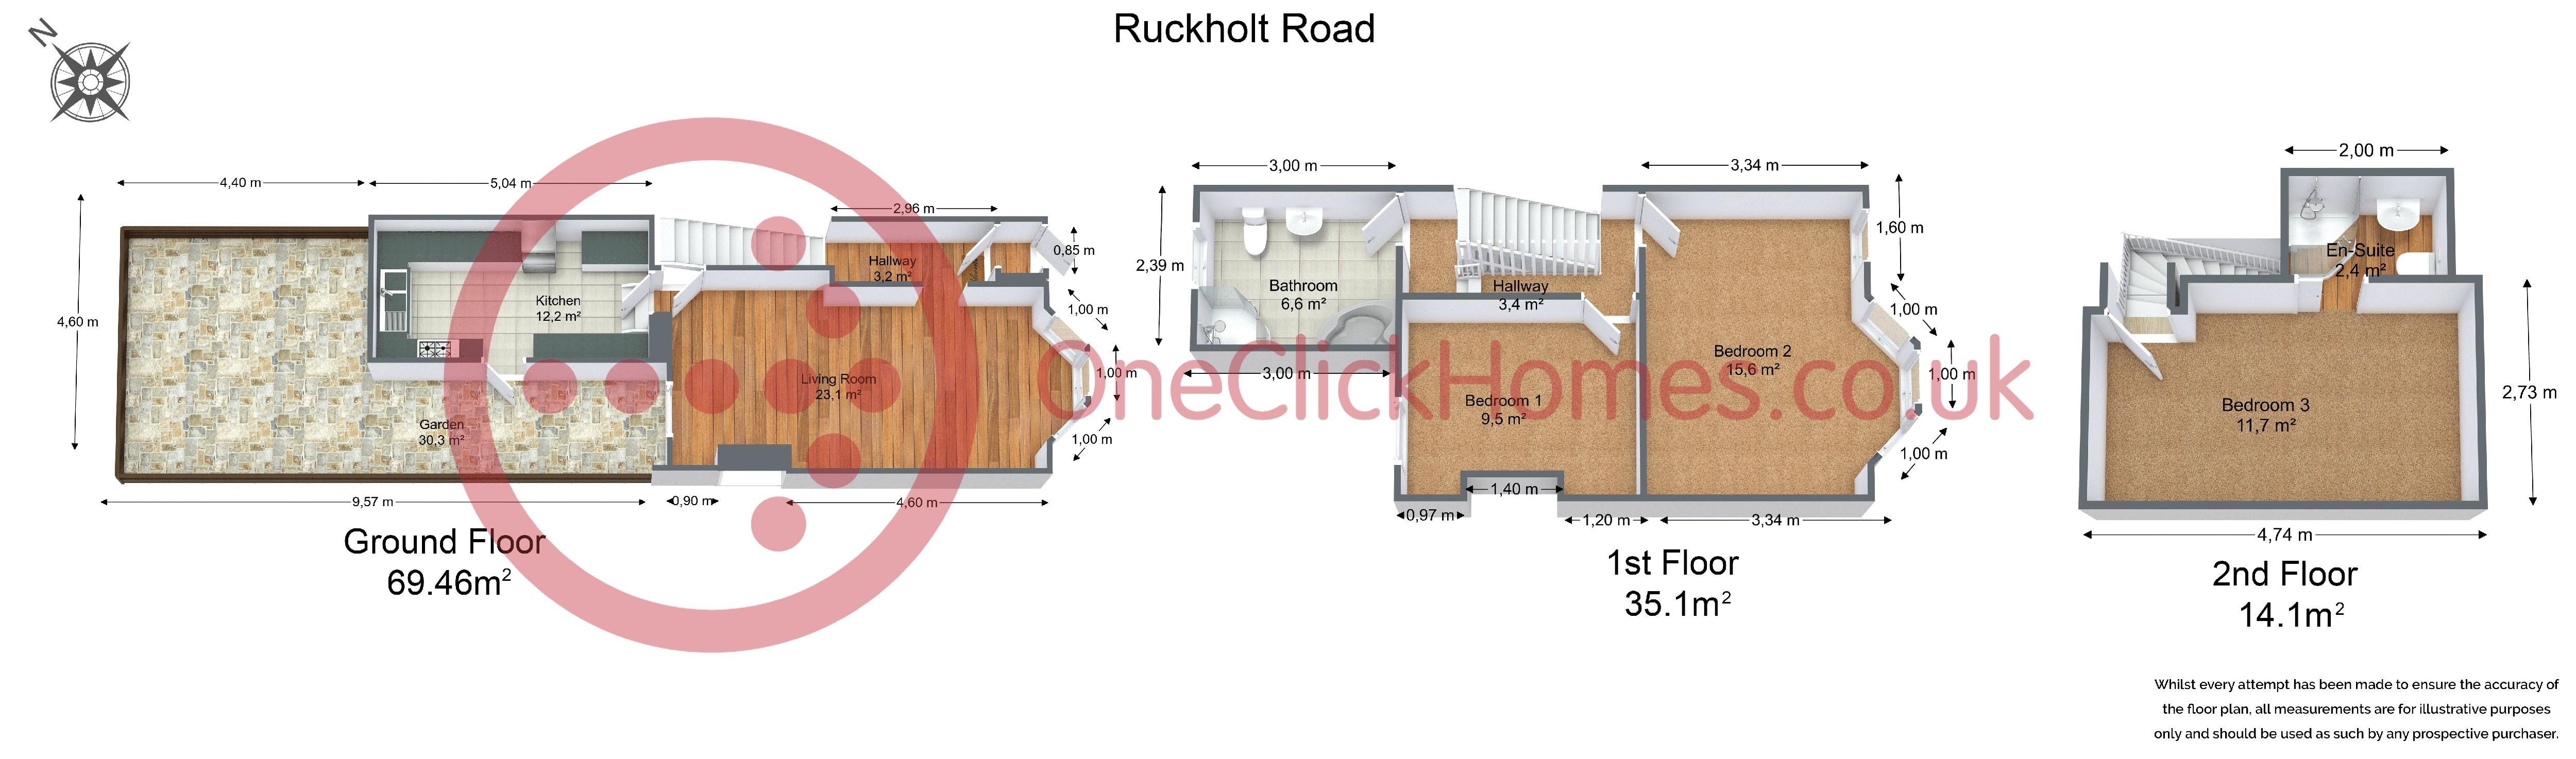 Ruckholt Road